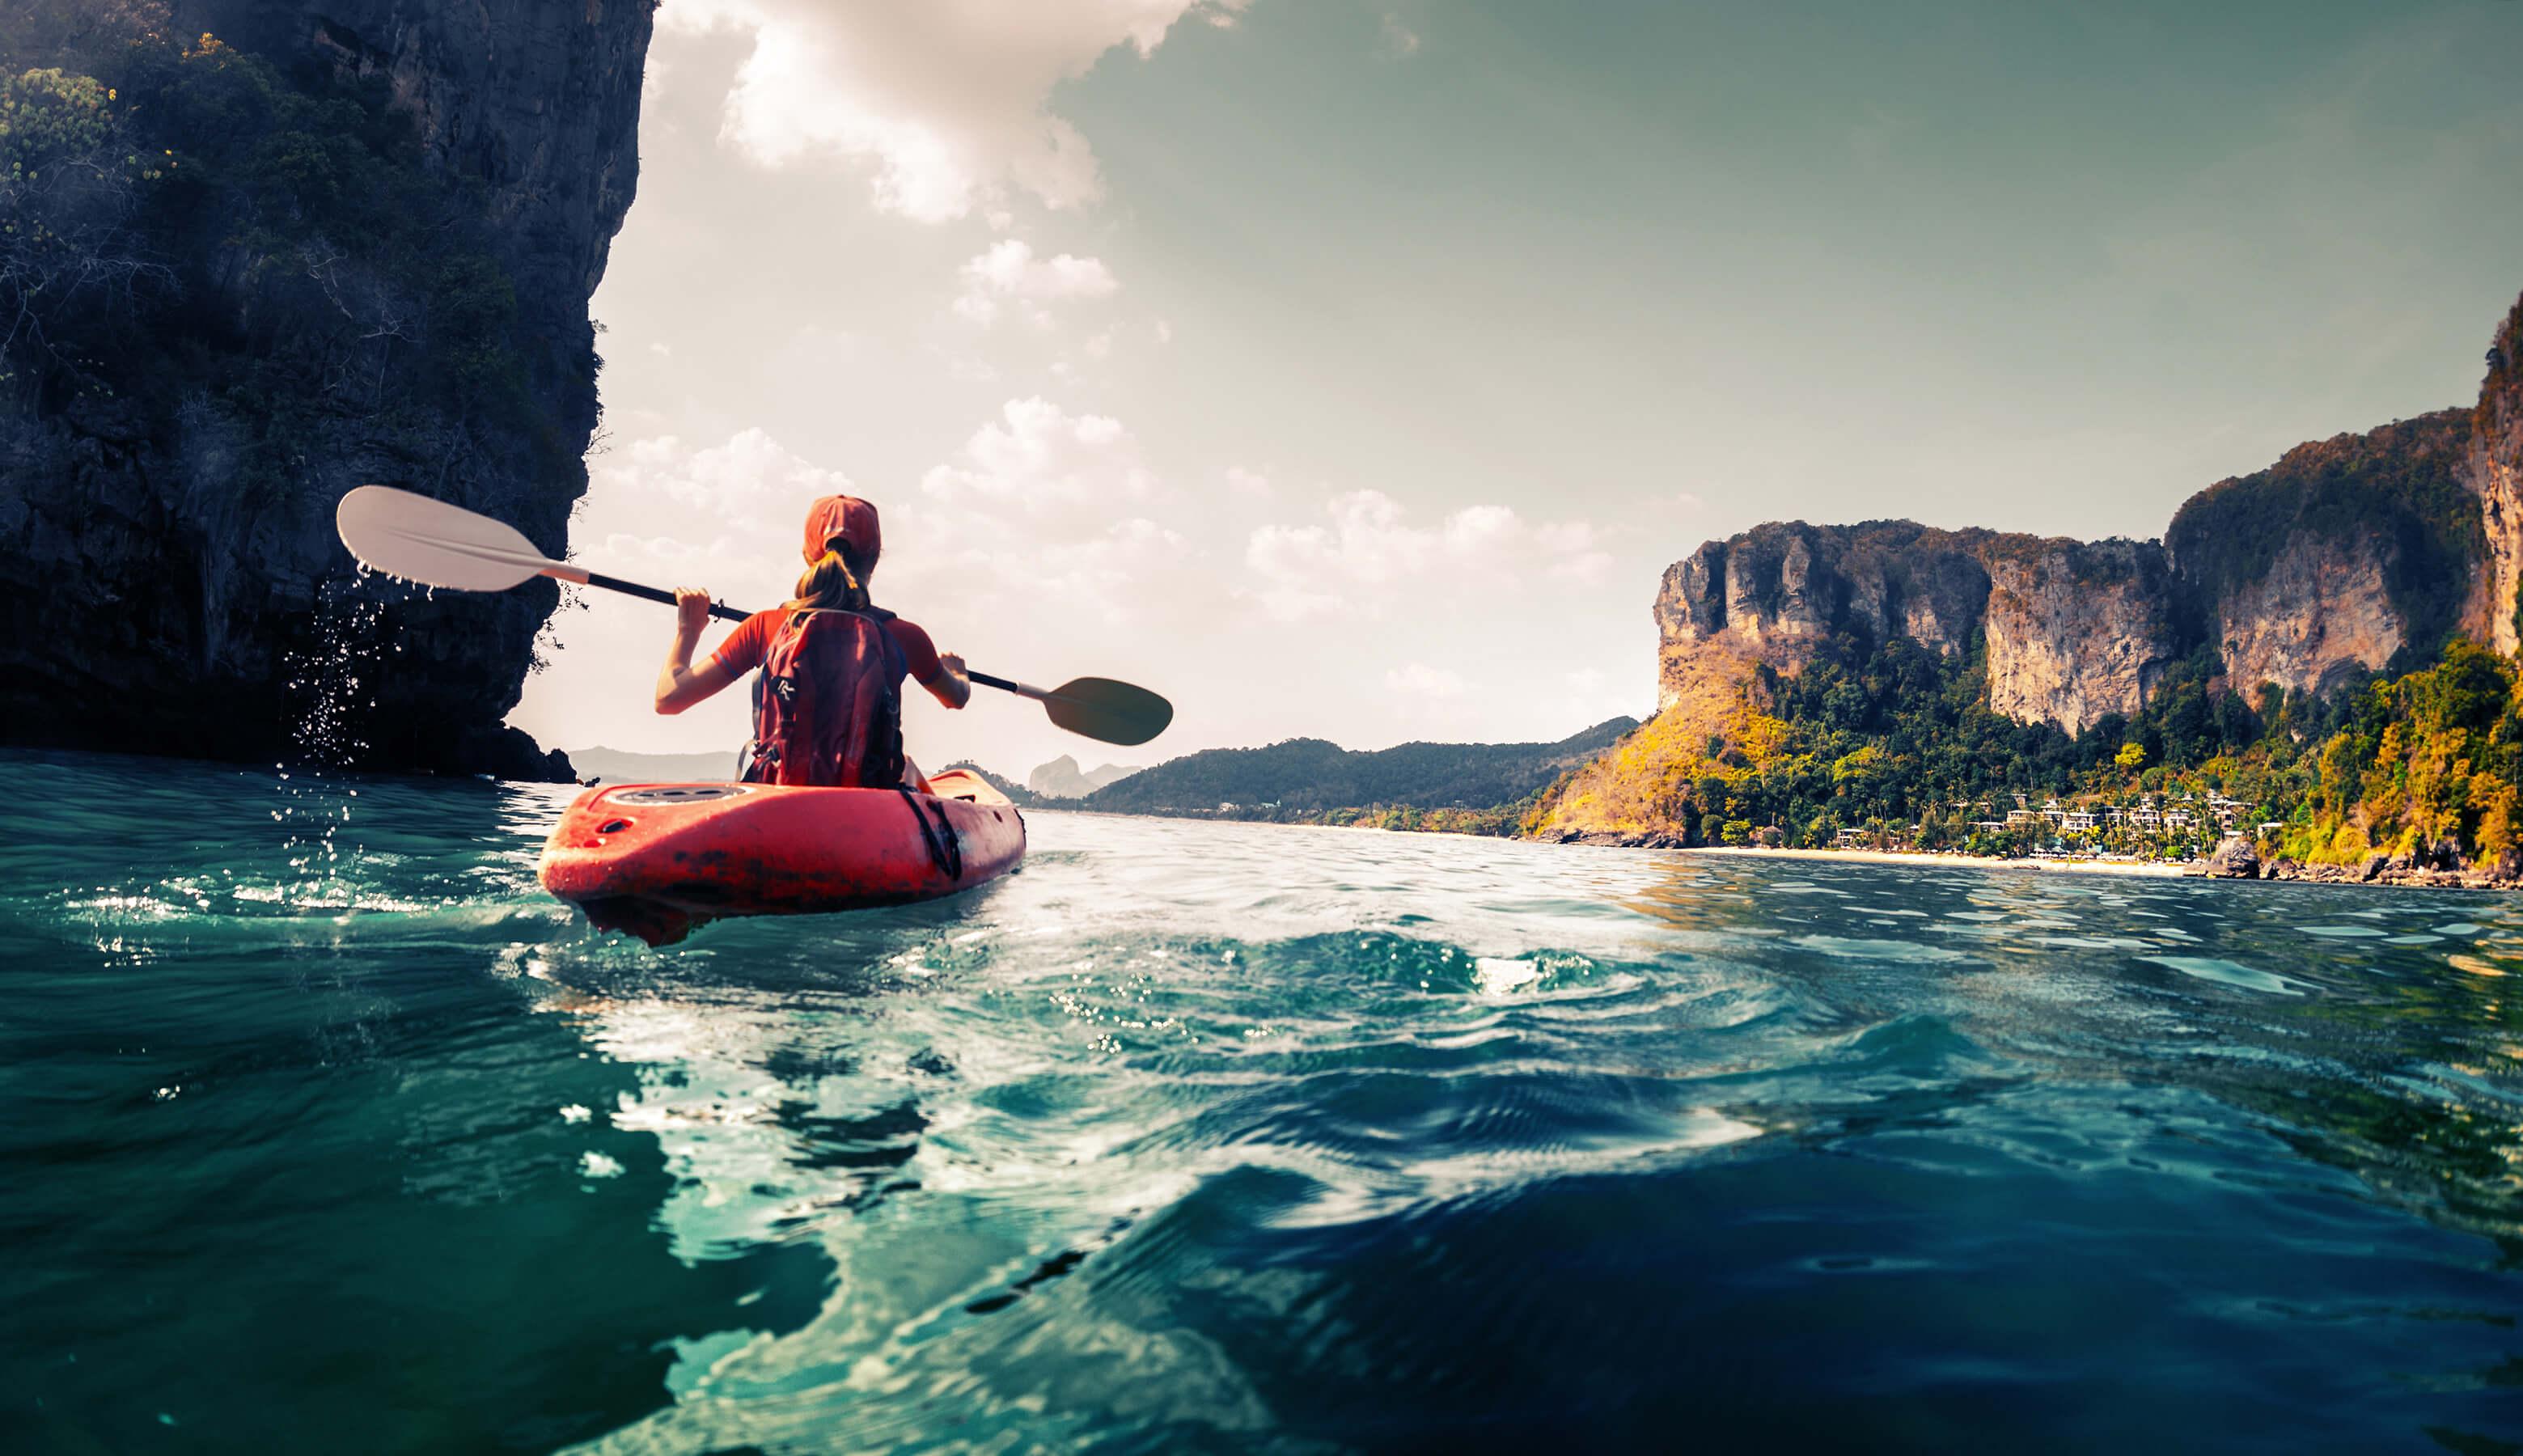 lady Kayaking in the waters off Railay beach, Krabi - places to see in Krabi